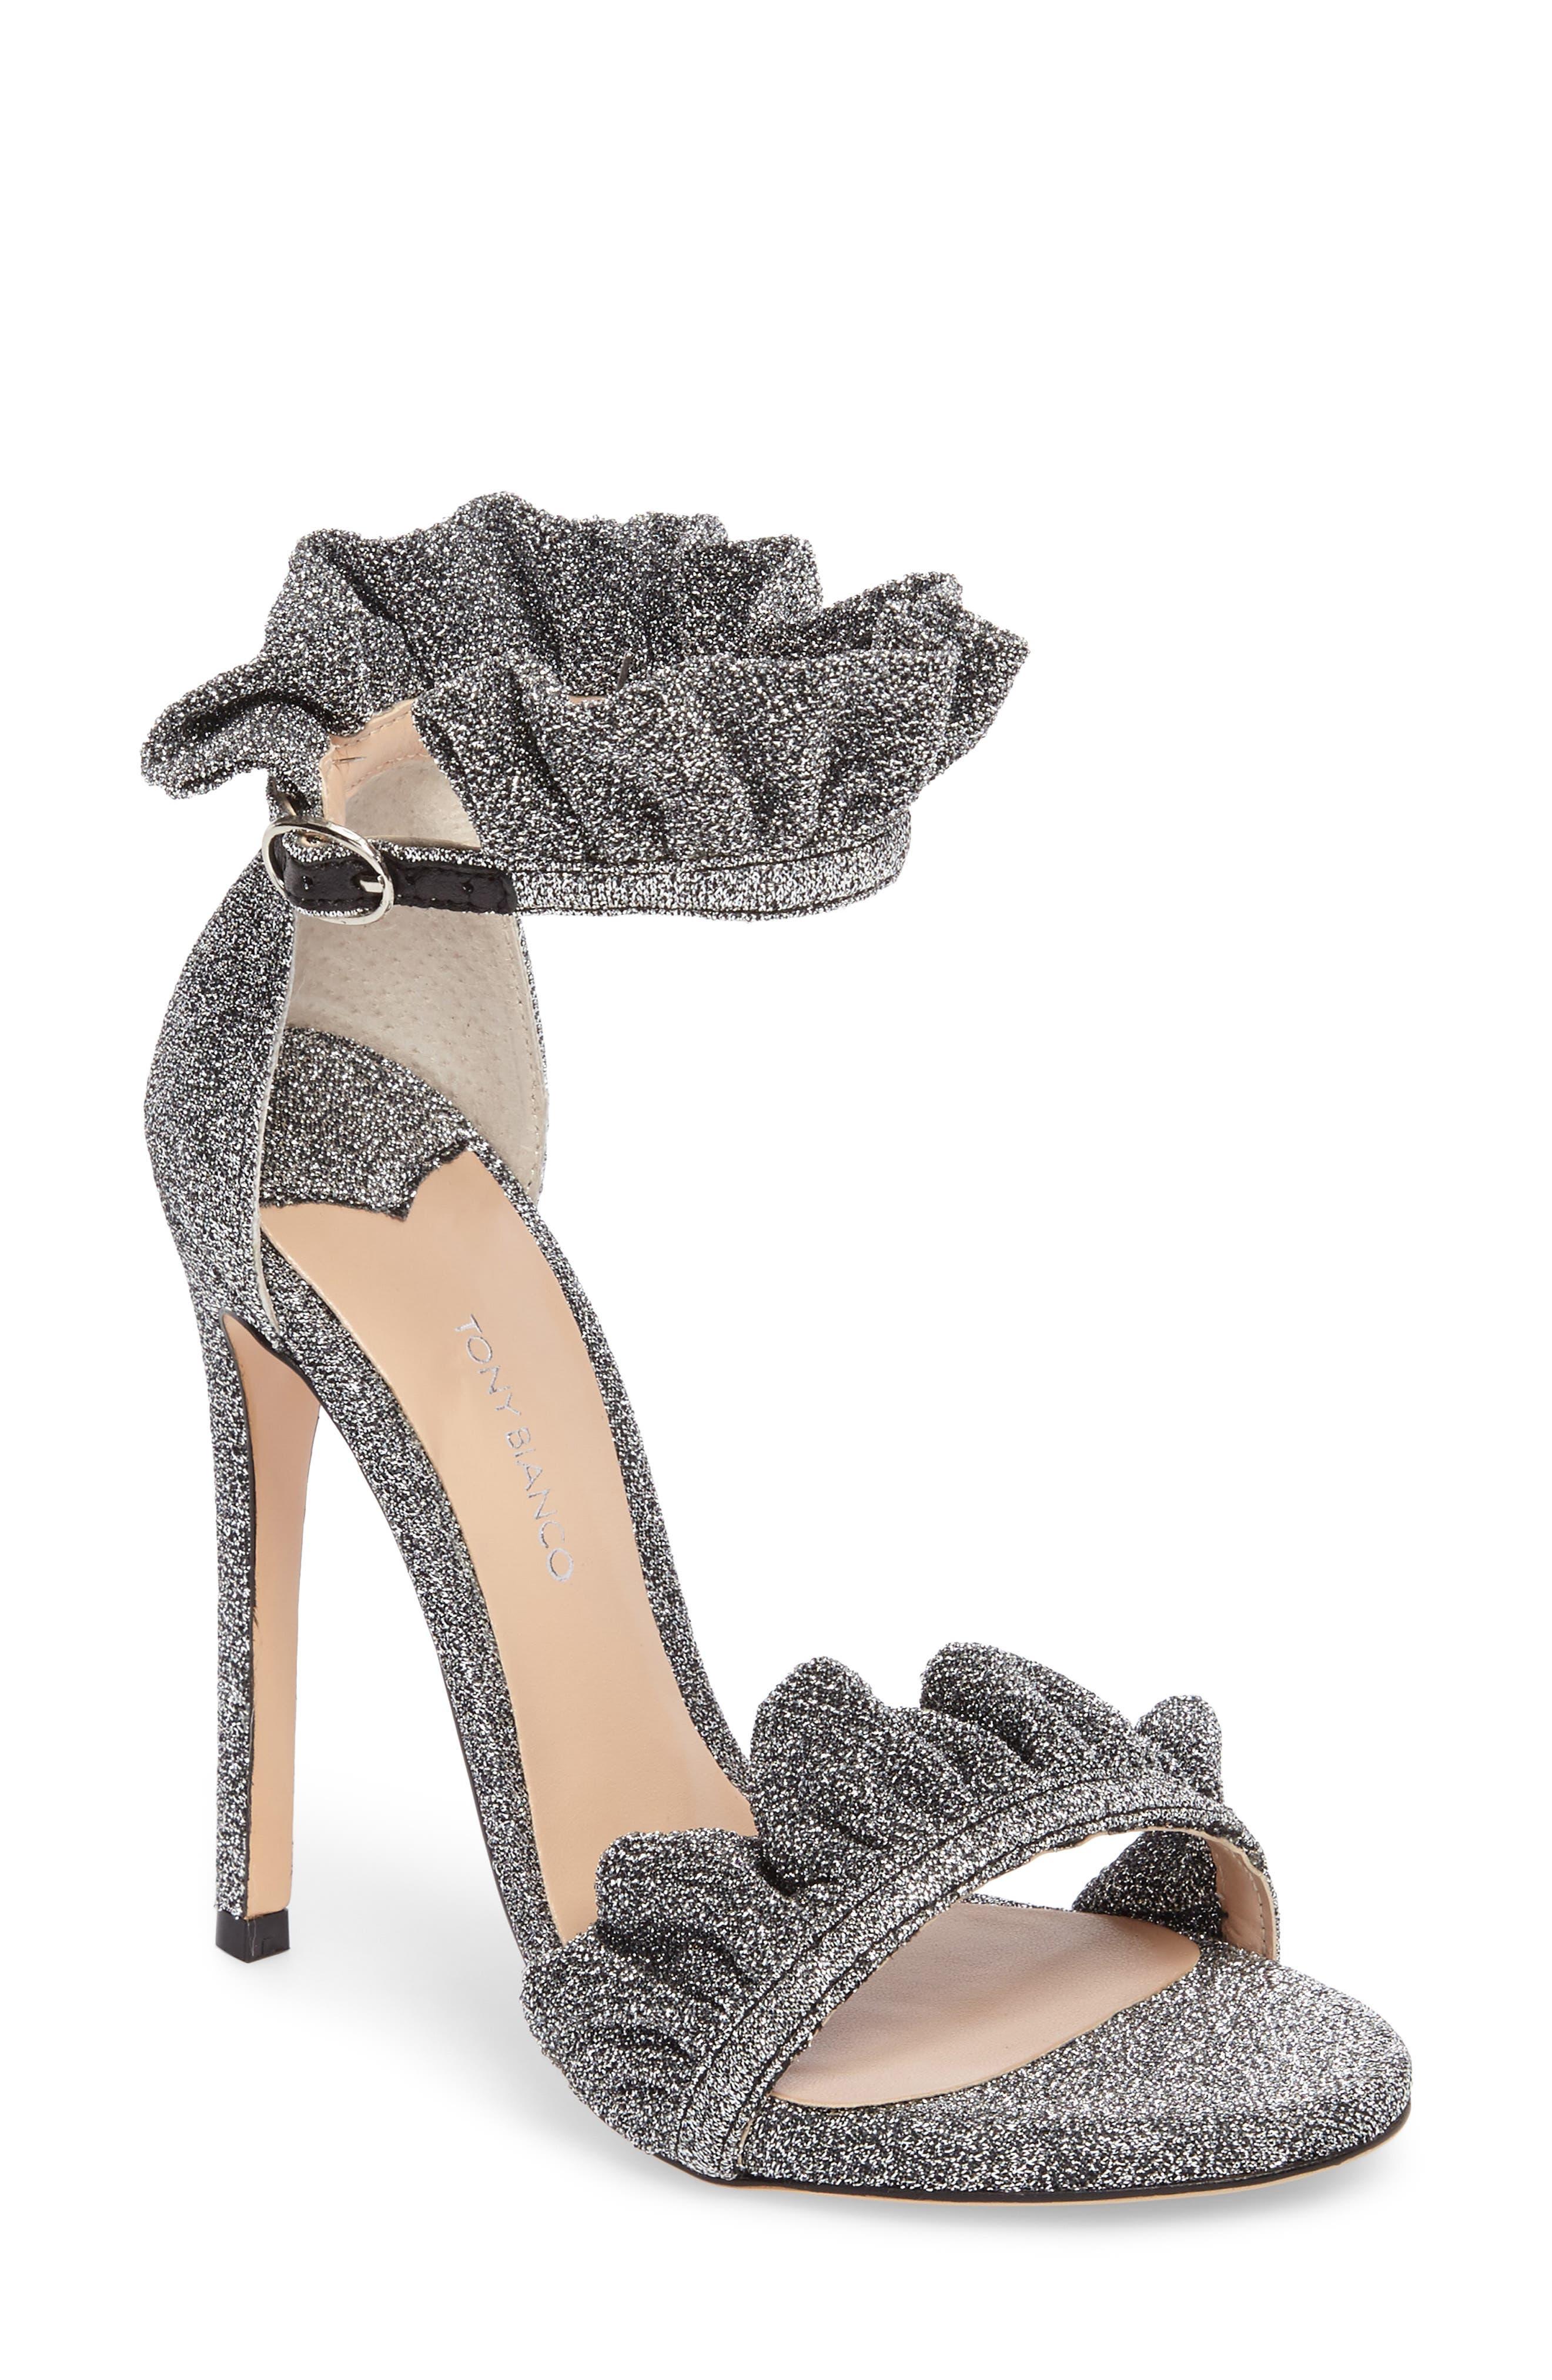 Alternate Image 1 Selected - Tony Bianco Ascot Sandal (Women)